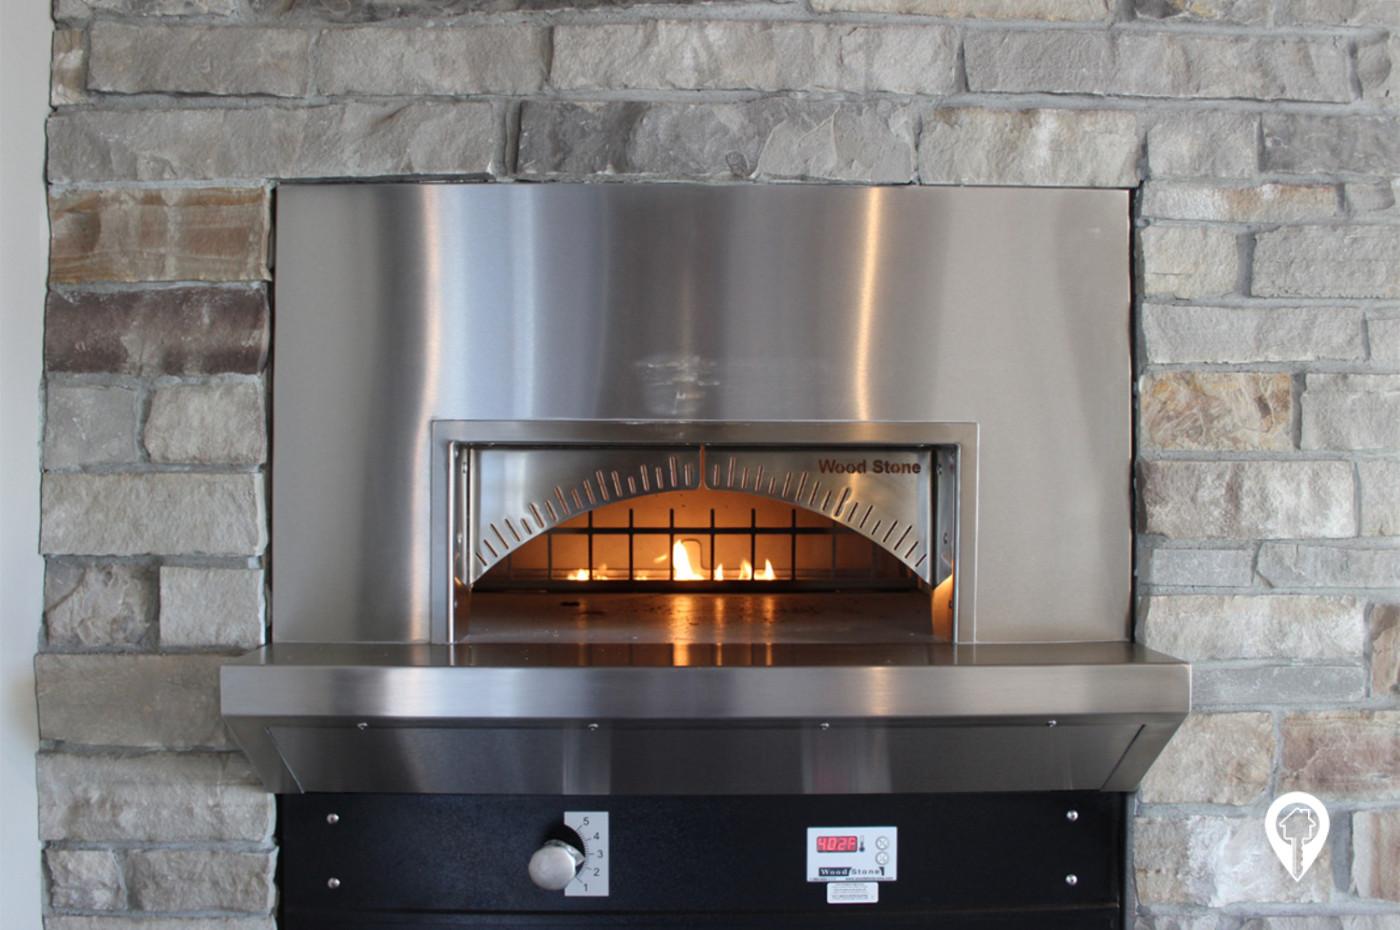 Deer-Ridge-Apartments-Brick-oven-pizza-anyone